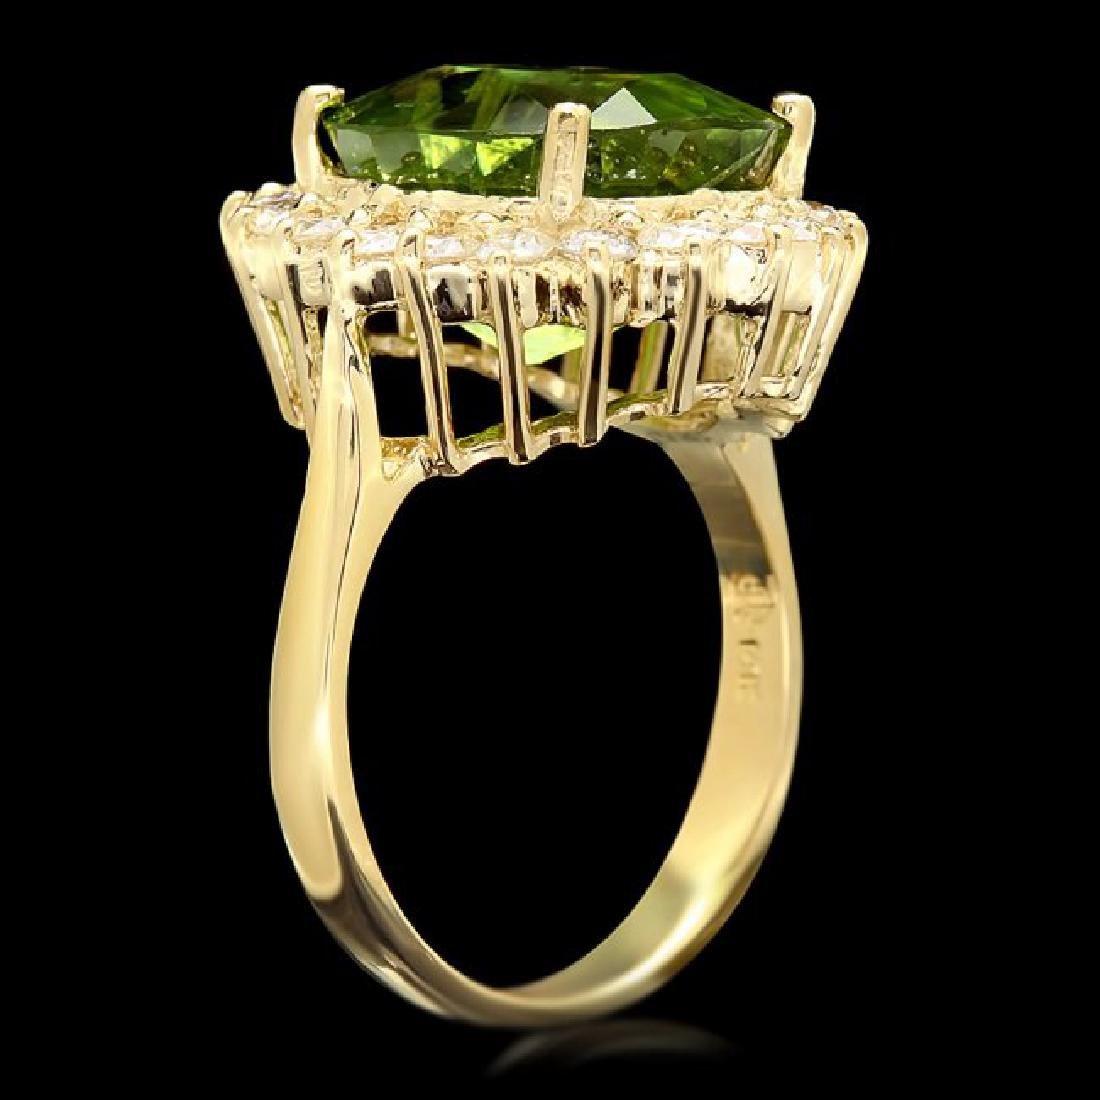 14k Gold 9.00ct Peridot 1.00ct Diamond Ring - 3